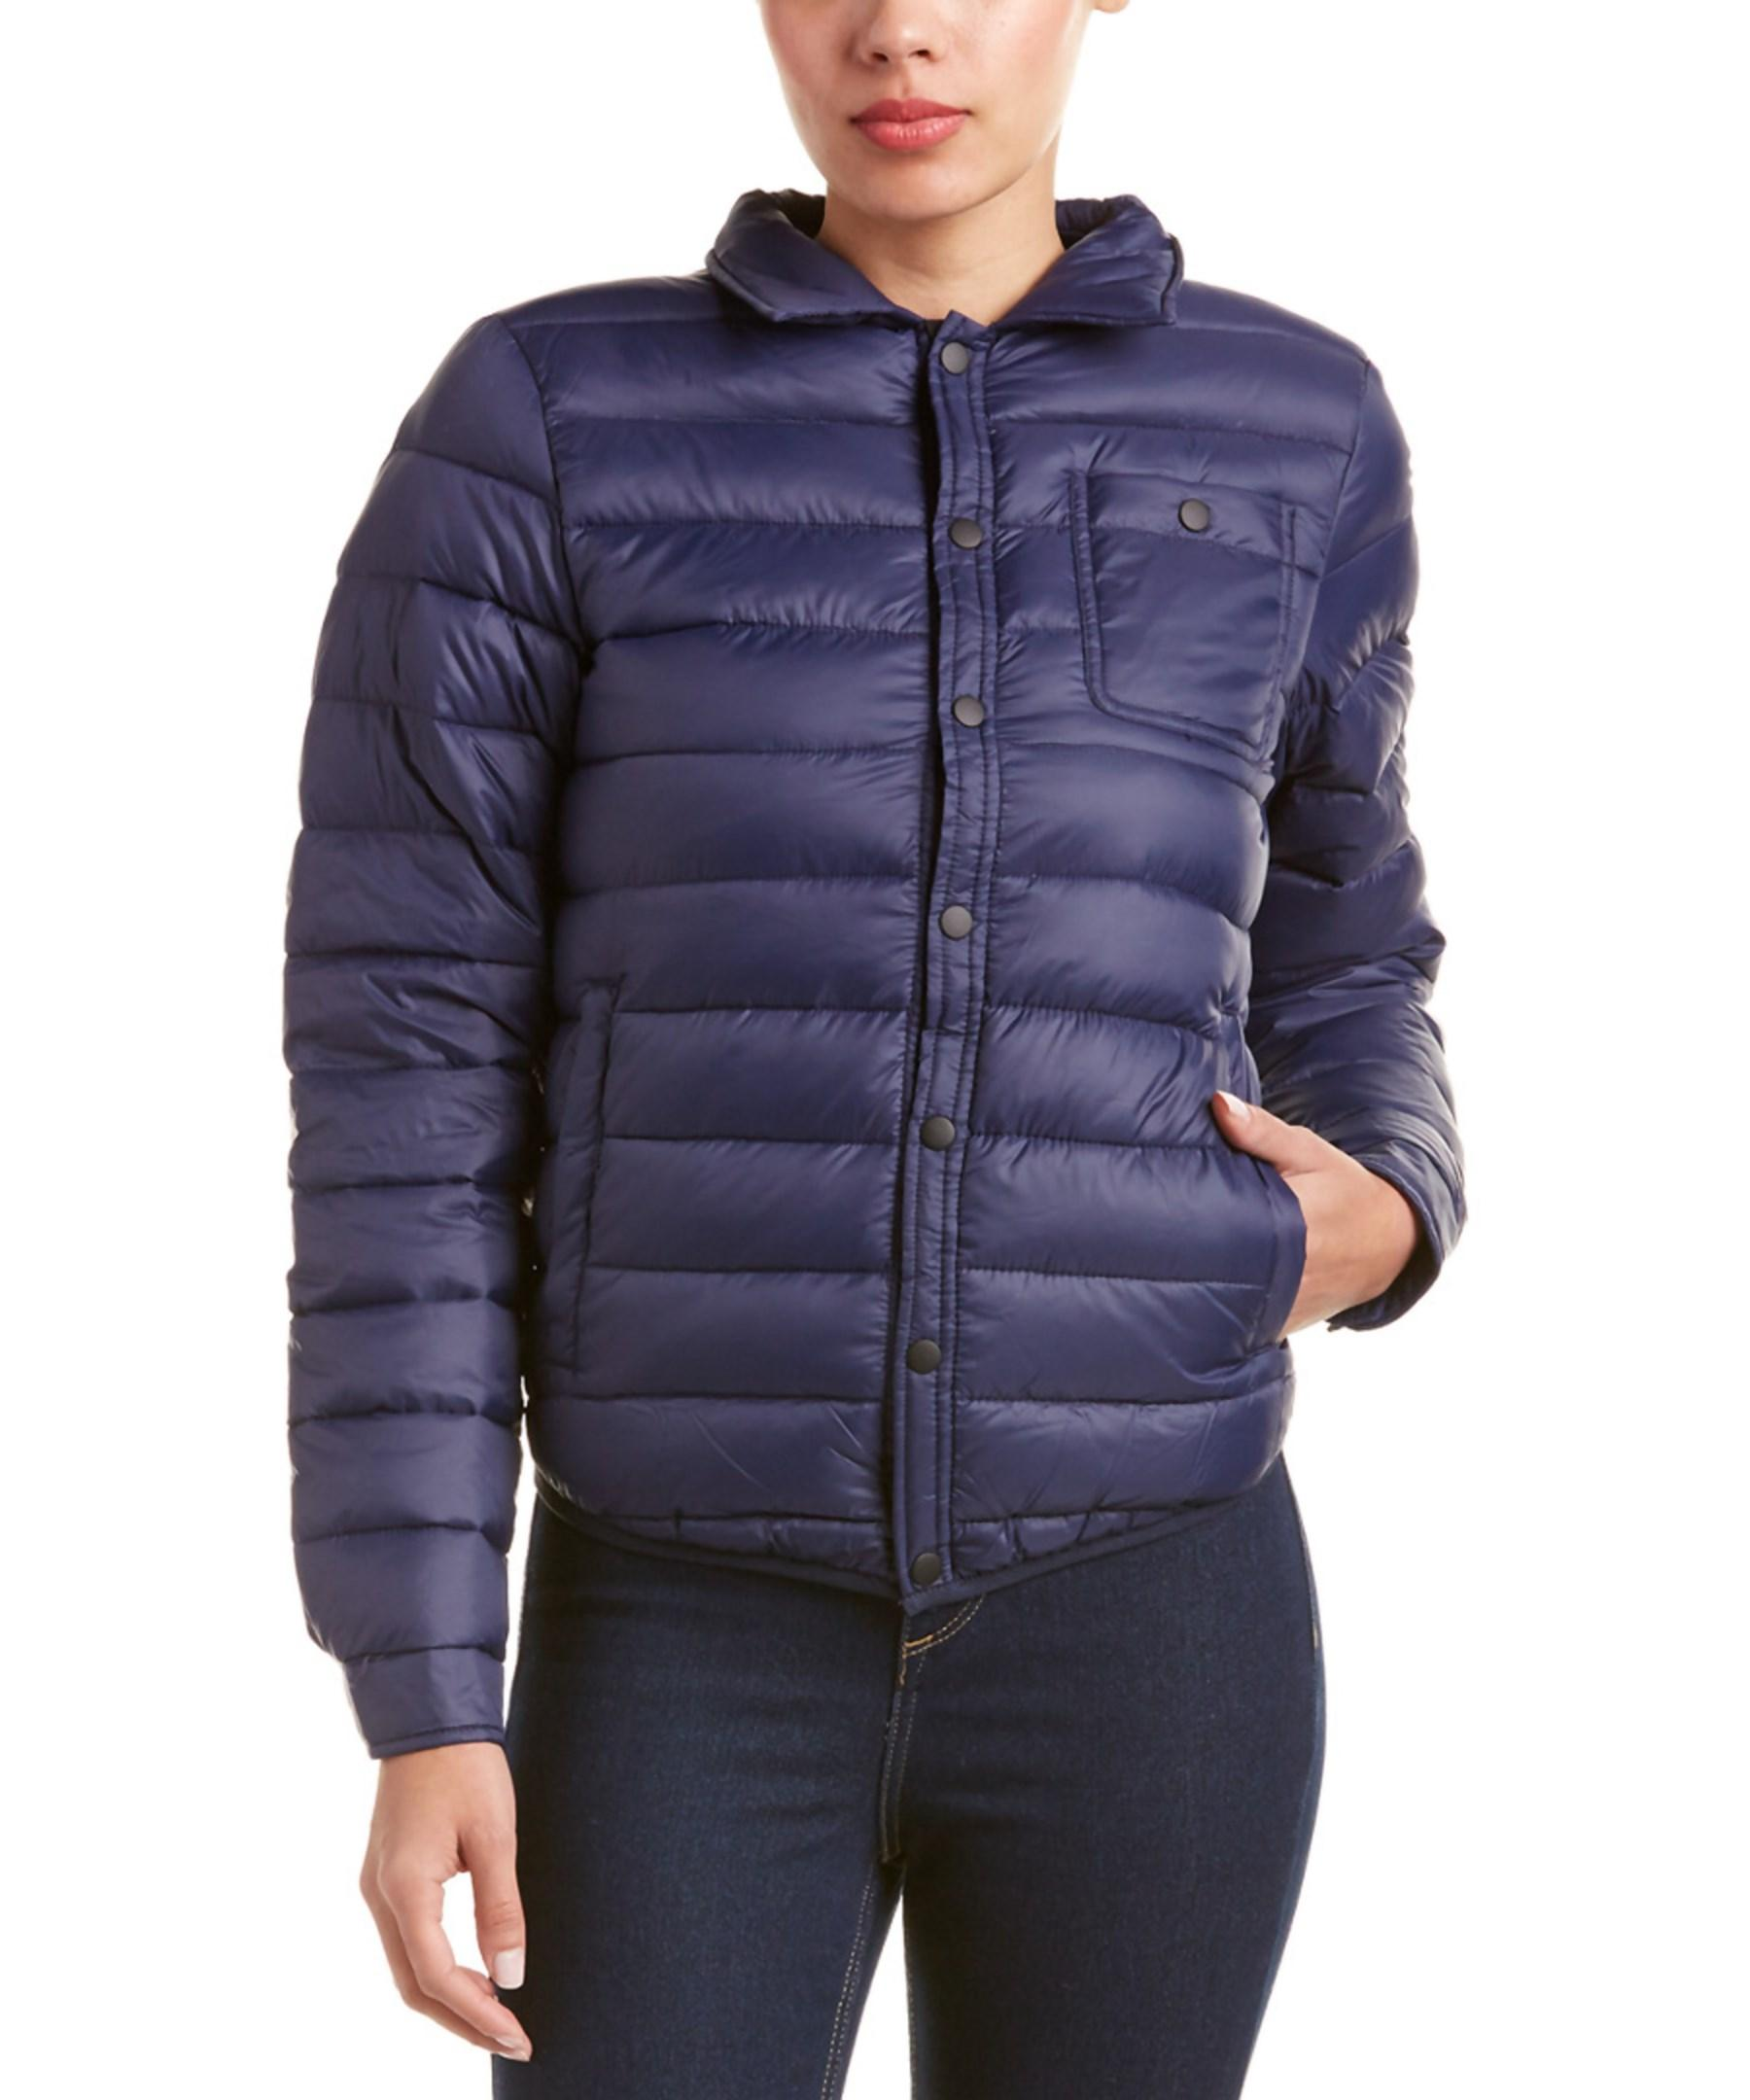 Slate And Stone Clothing : Slate stone jacket in blue lyst